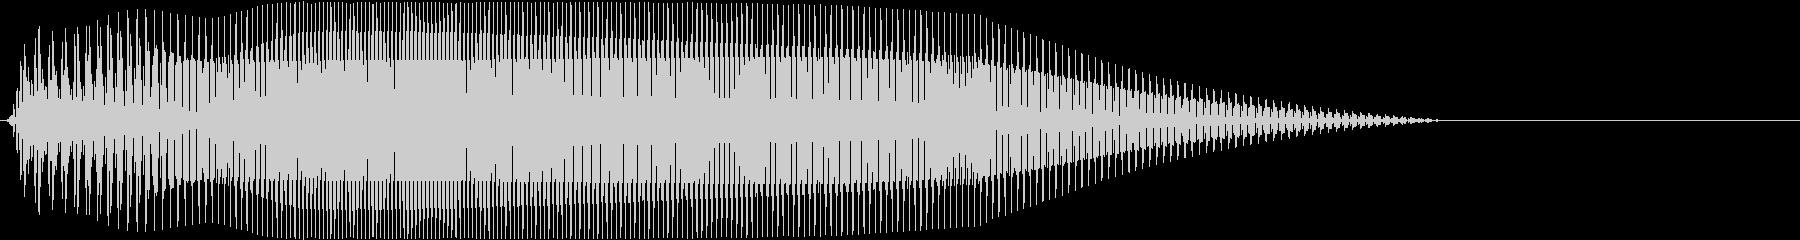 Game 横スクロール系ゲーム 効果音2の未再生の波形